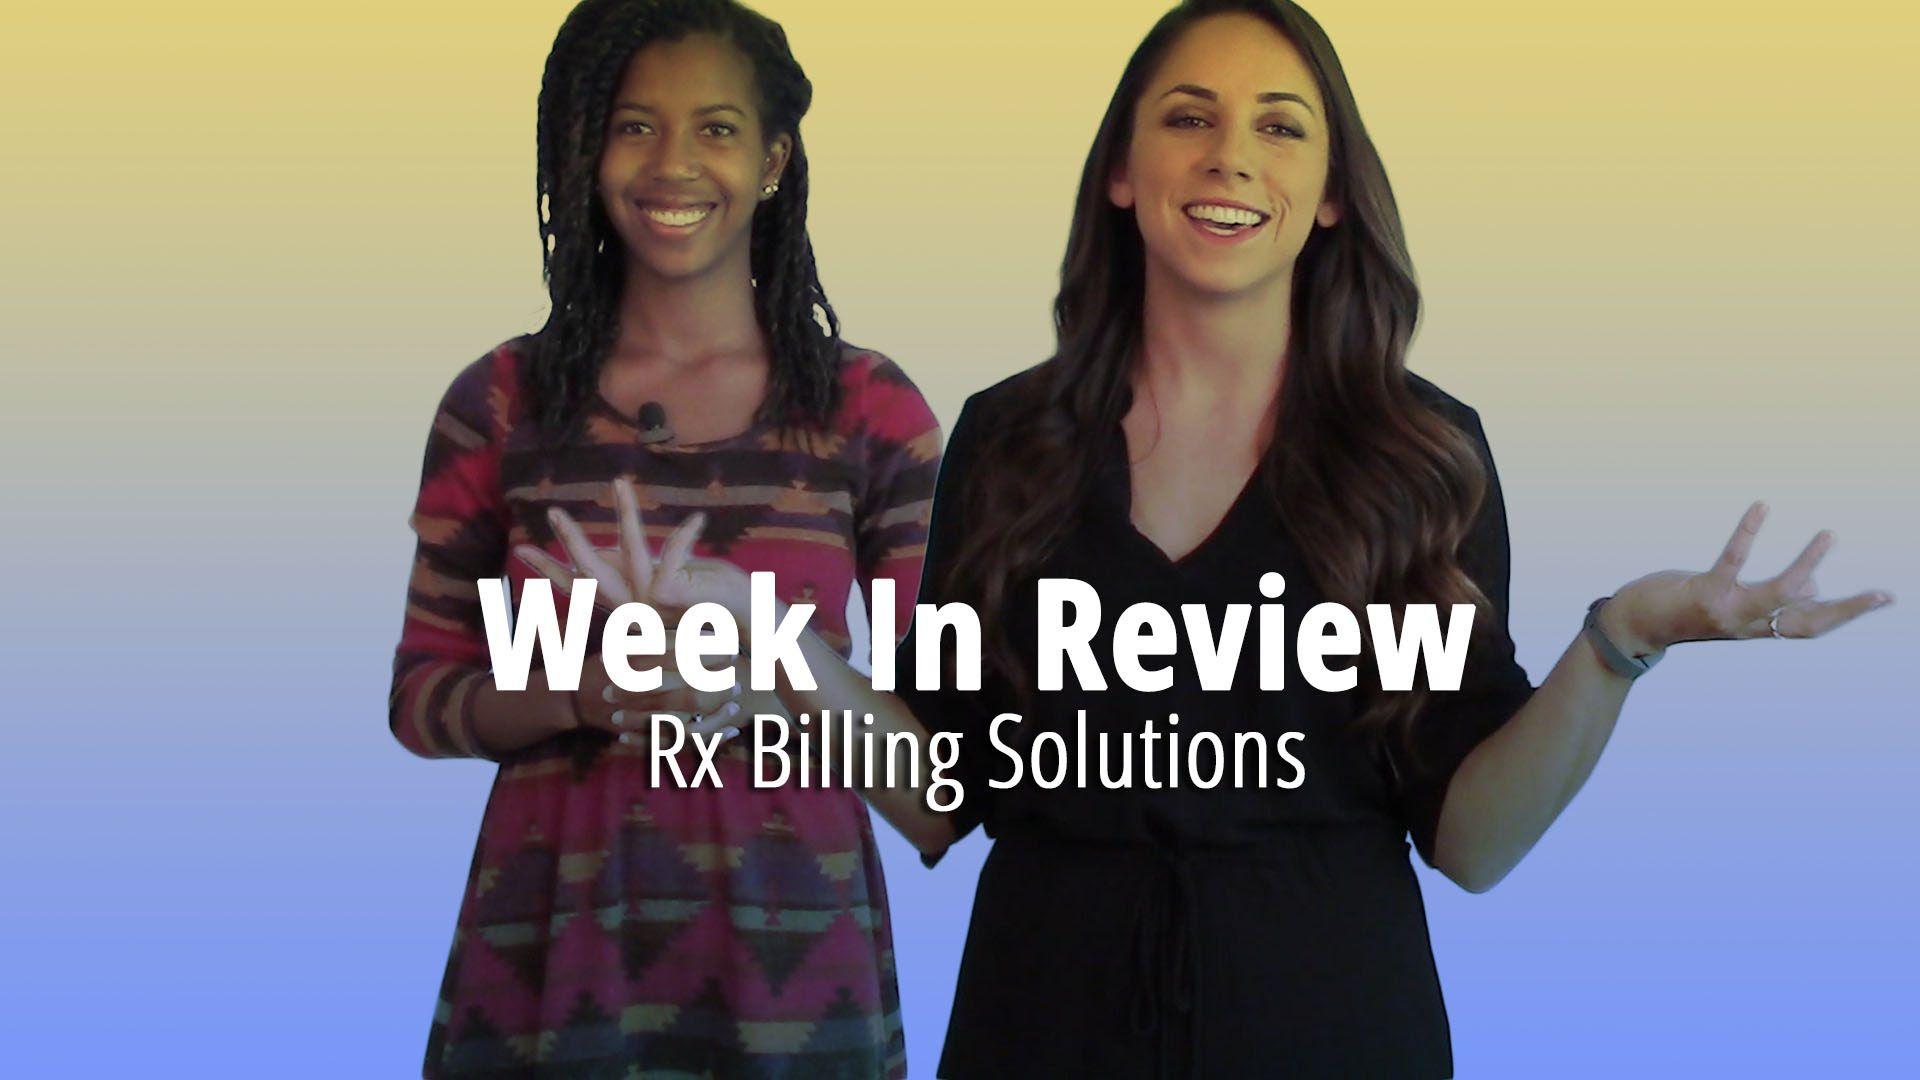 FRAUD & BALANCE BILLING! Billings, Women, Youtube